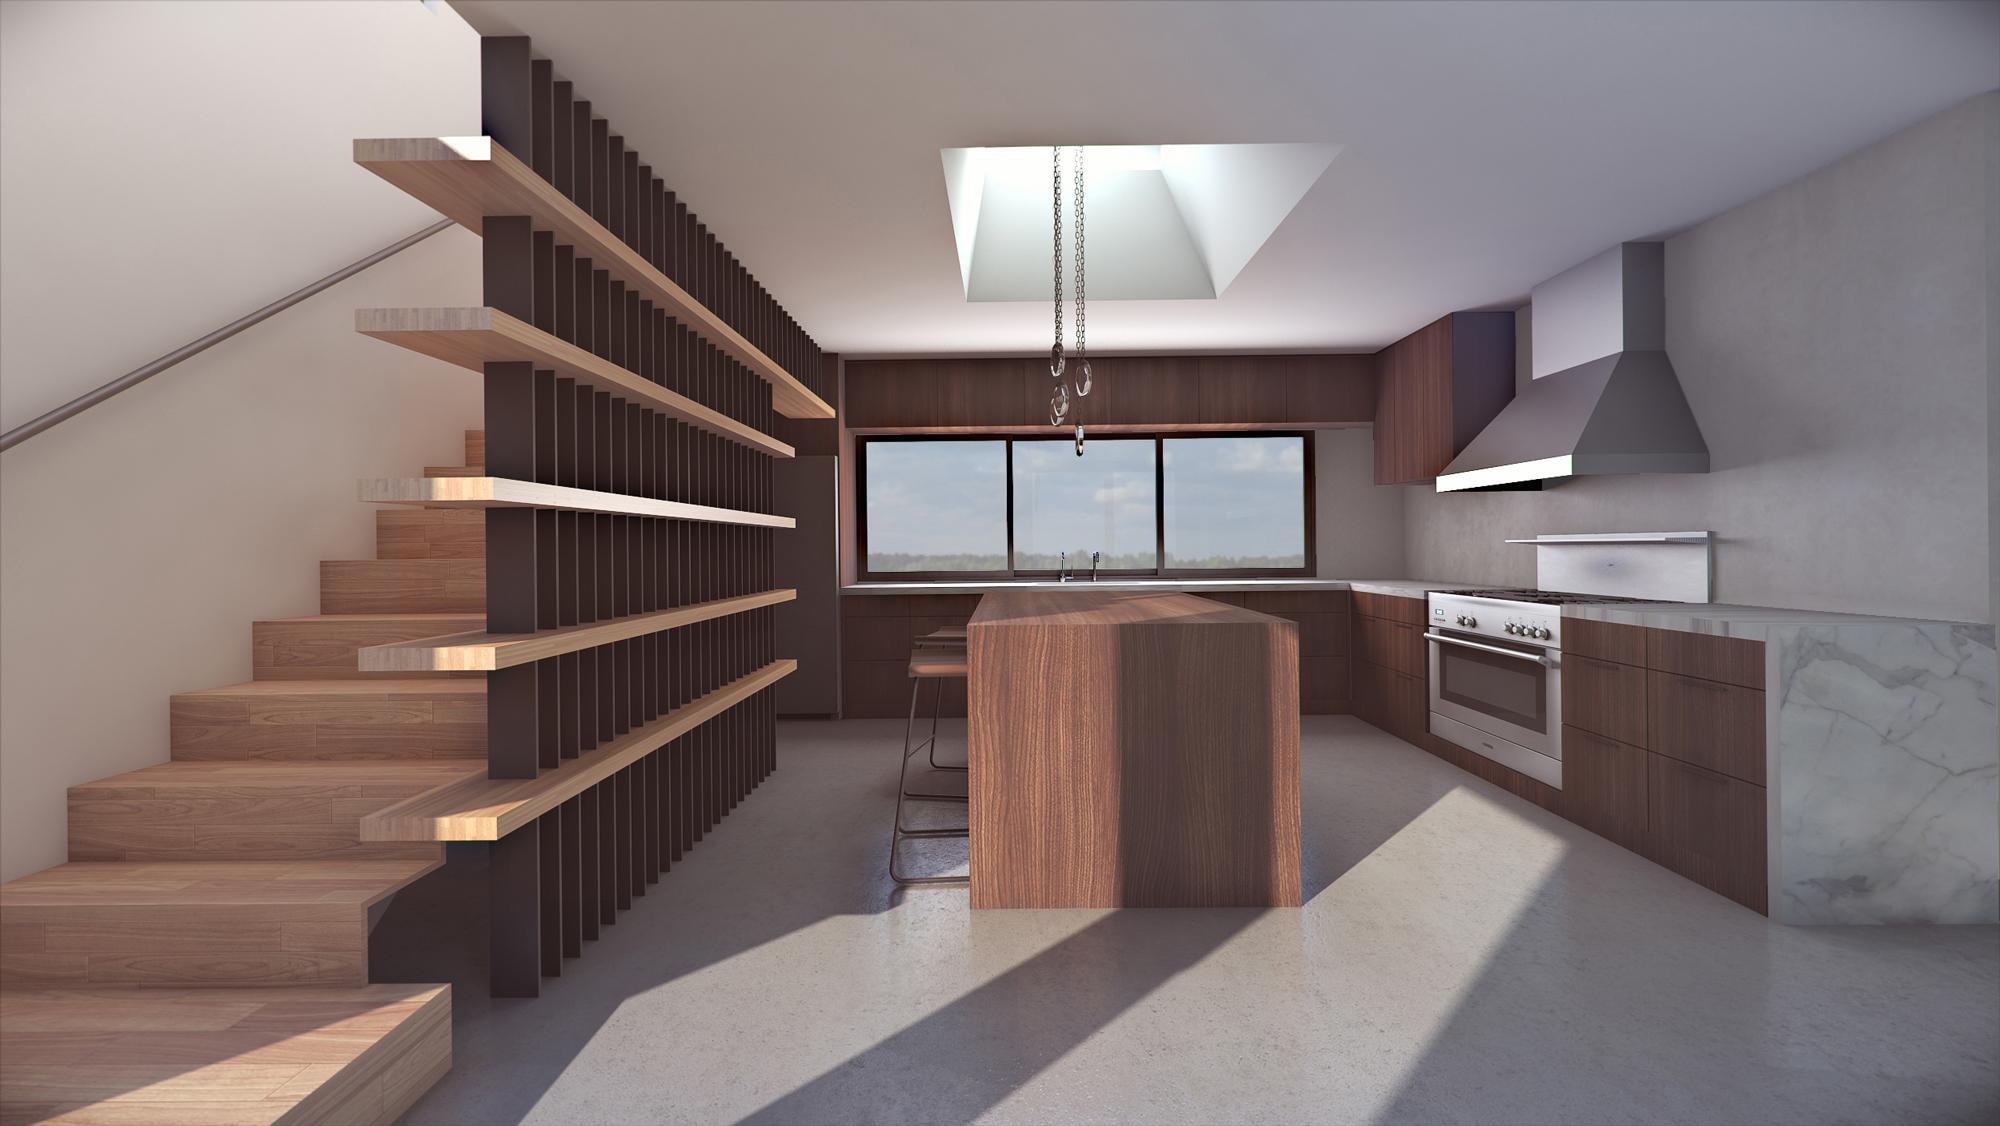 Custom Kitchen 3d Render American Render 3d Rendering Miami